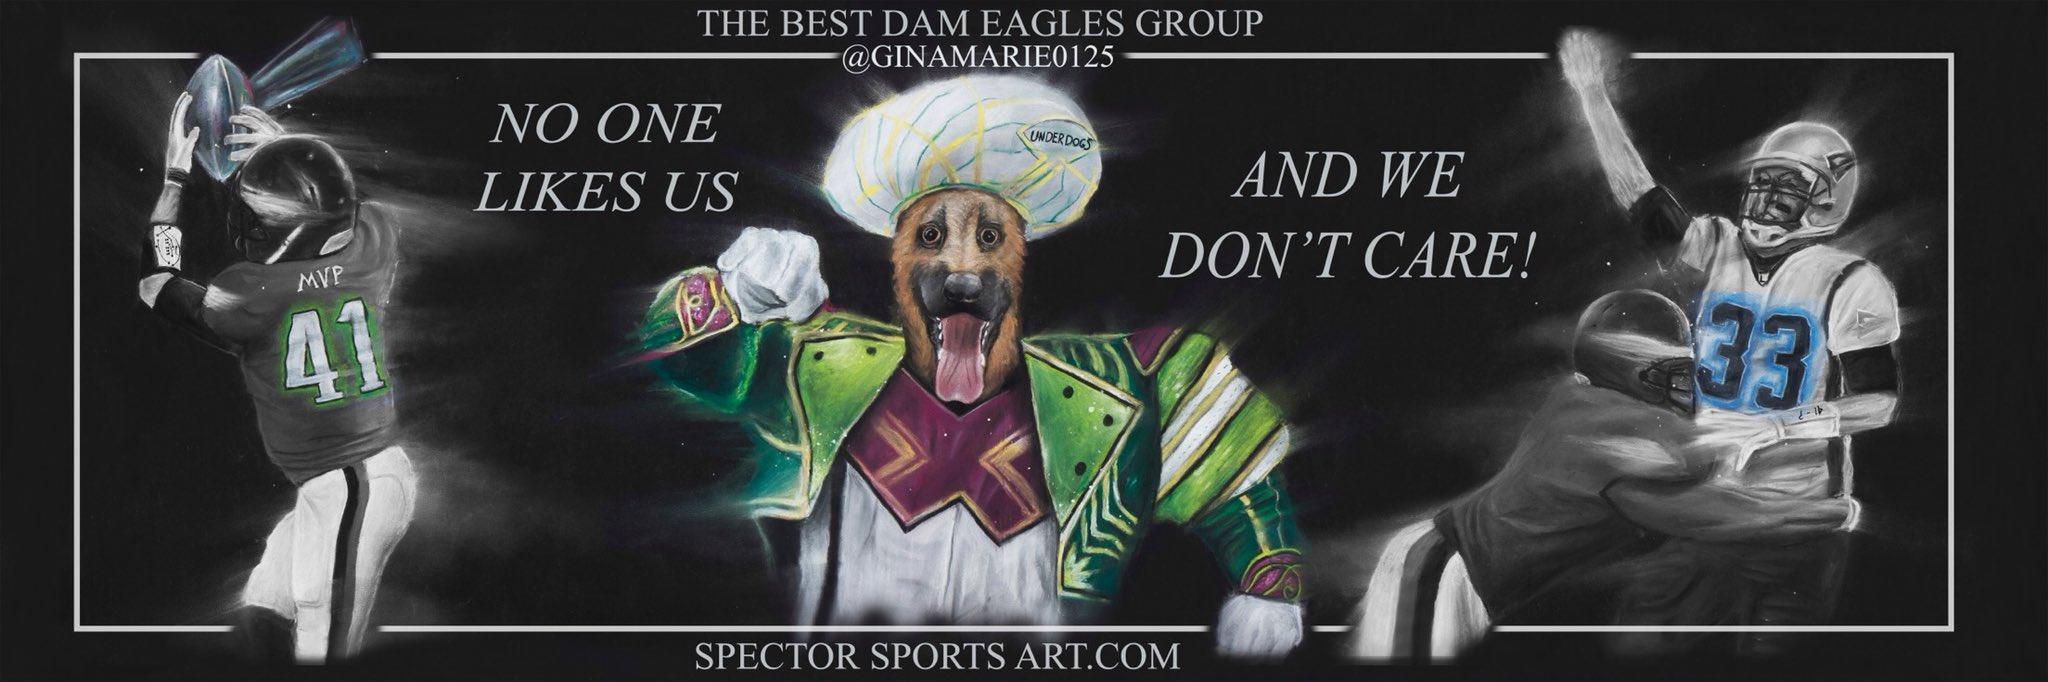 Puke-Worthy Eagles Billboard to Go Up Near Gillette